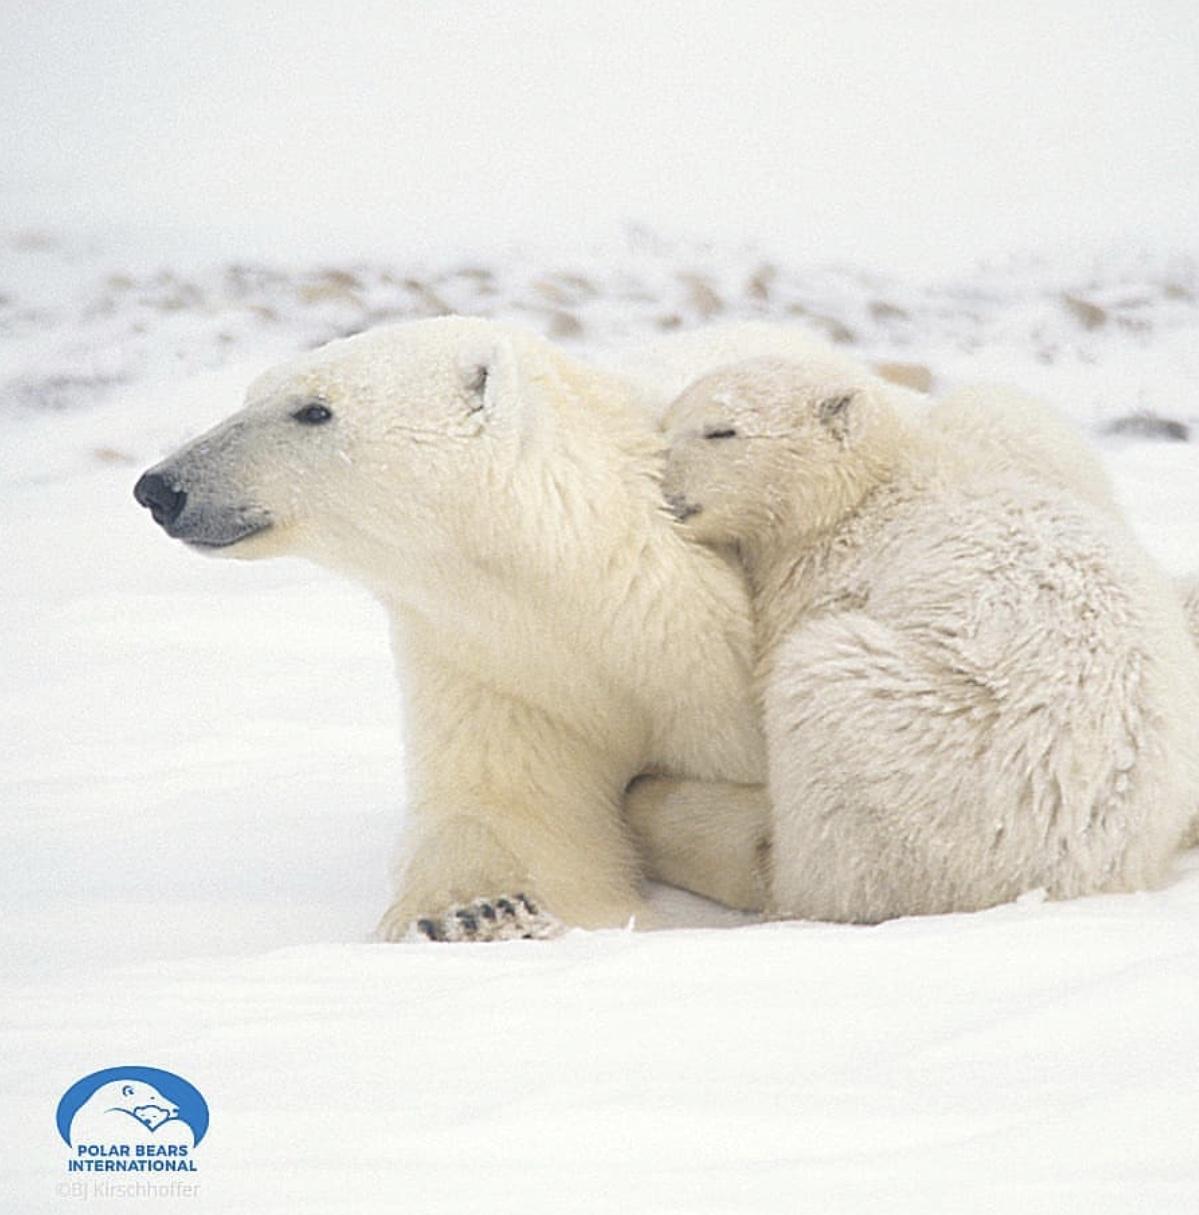 Mama polar bear and her cub (photo by:  @polarbearsinternational )